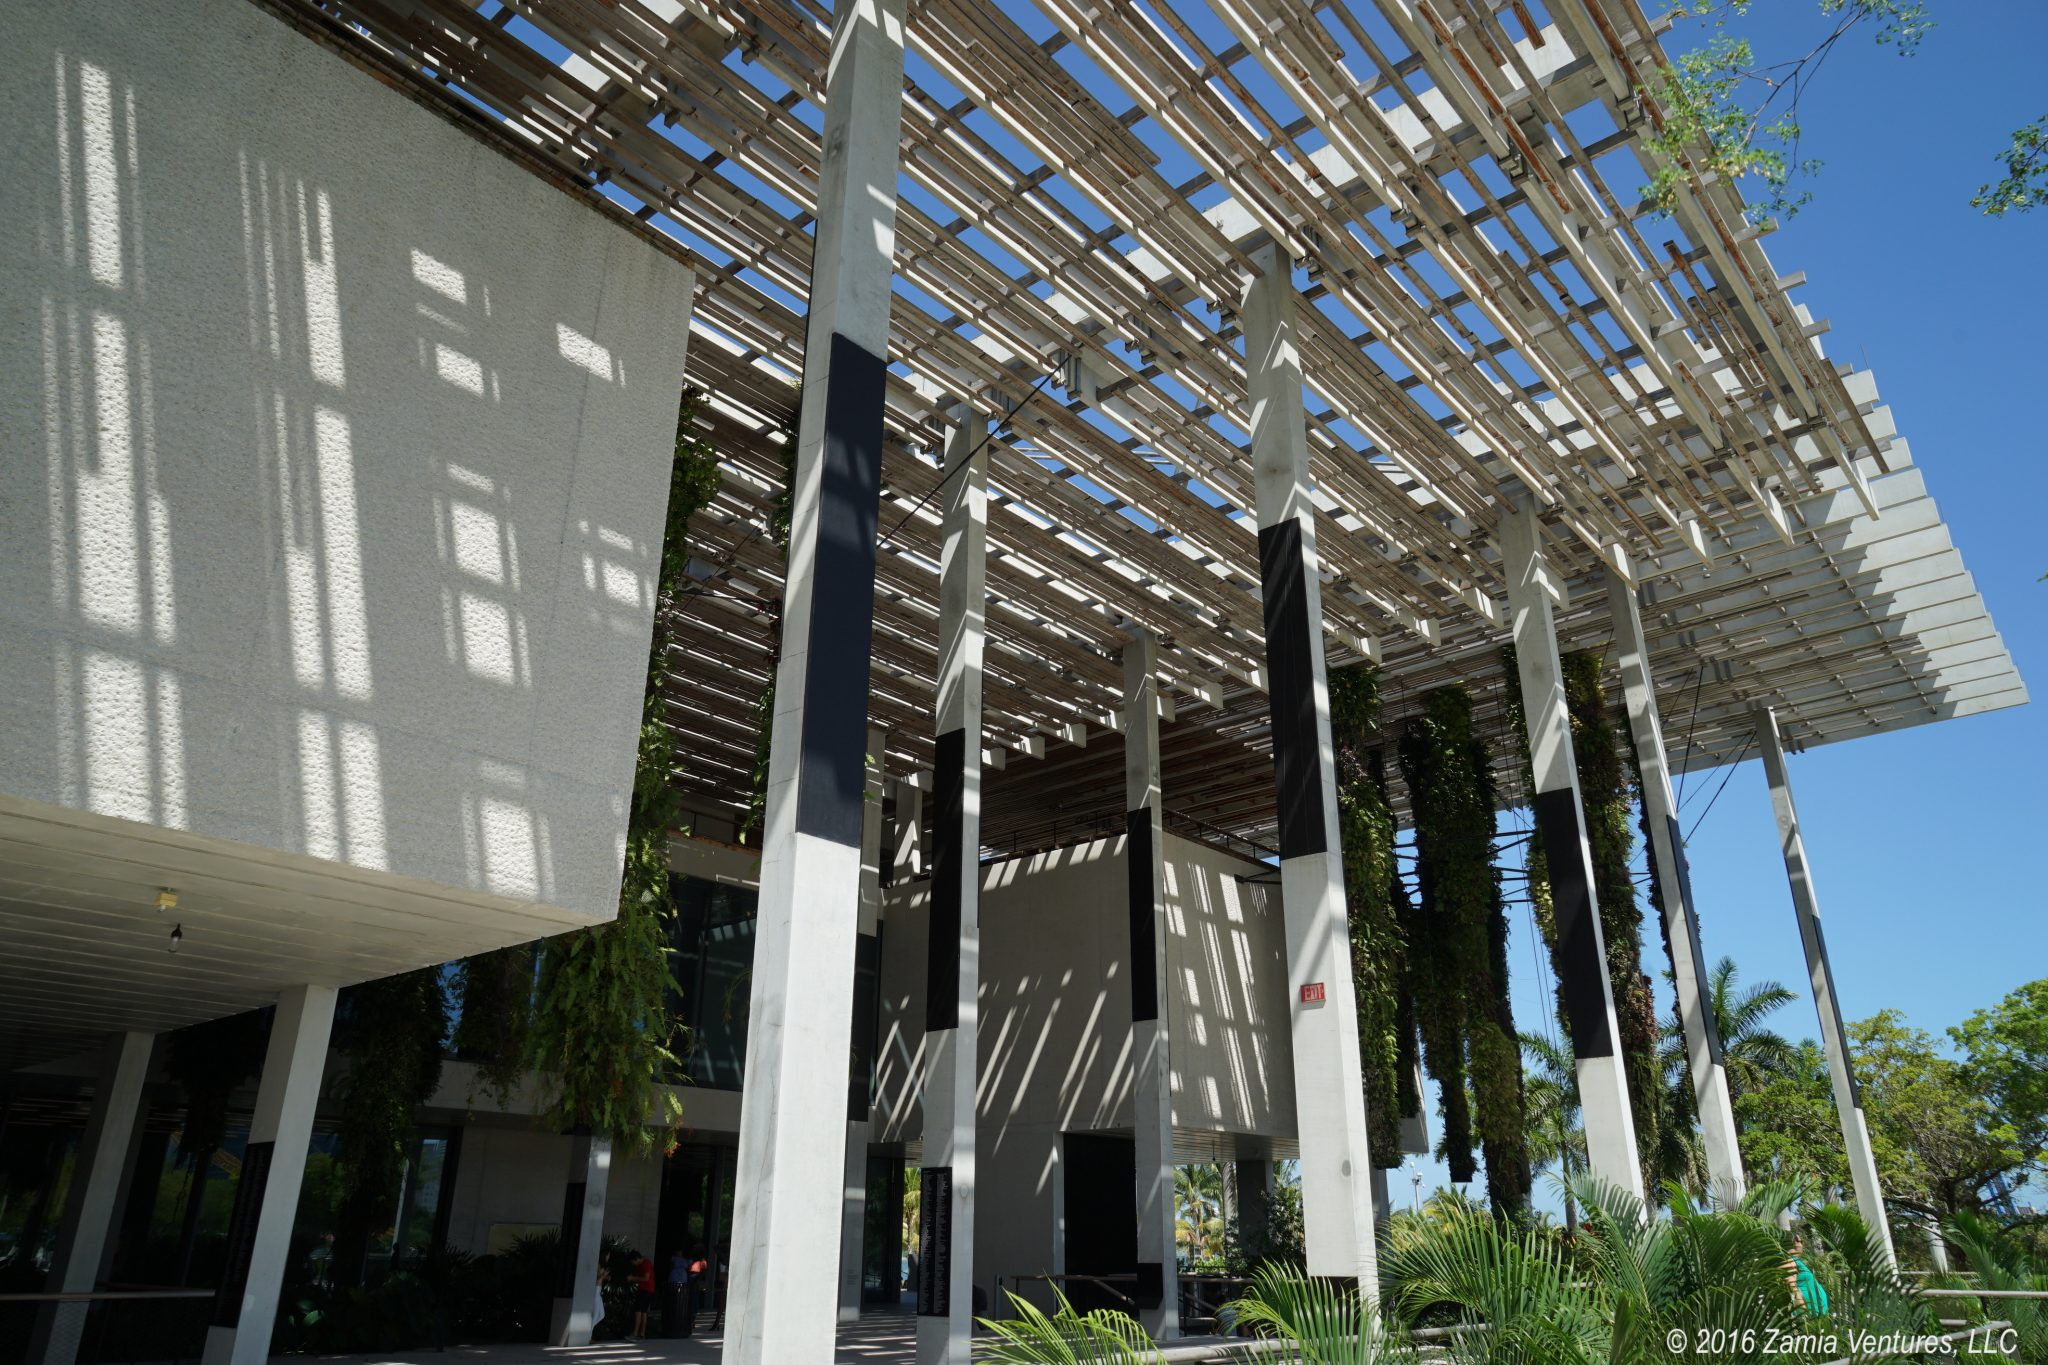 Perez Art Museum Miami: Stellar Architecture